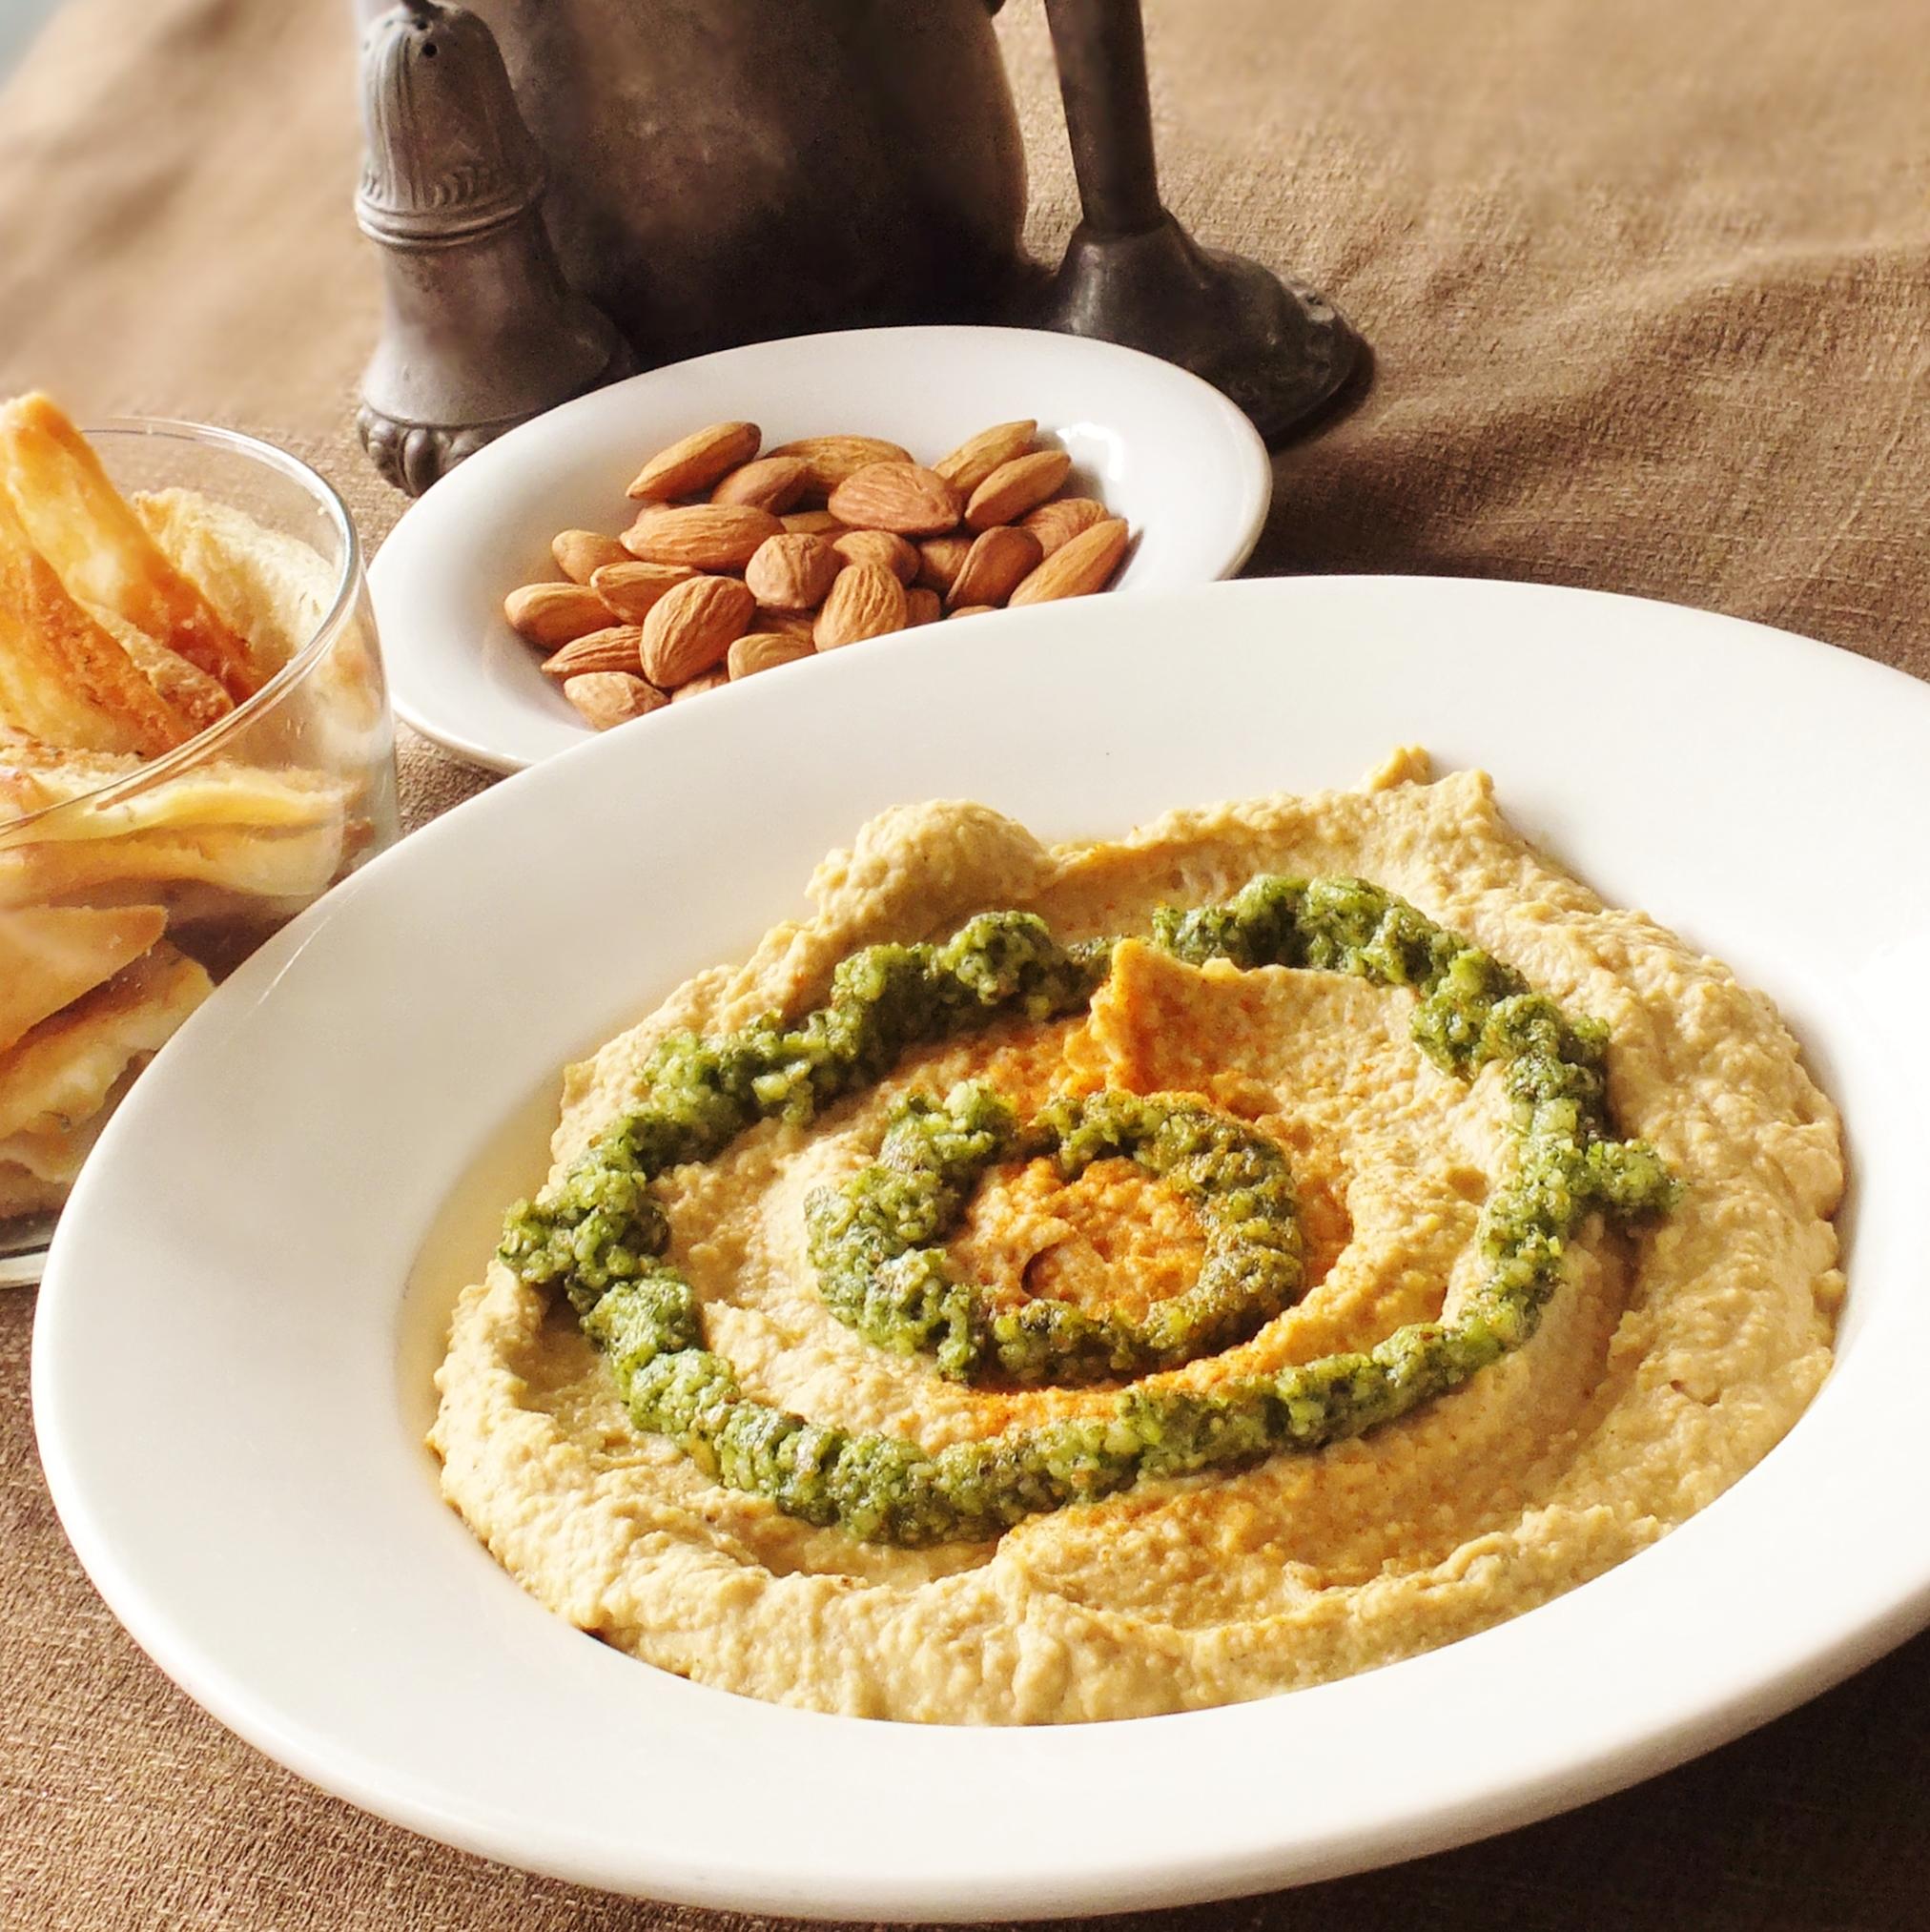 Curried Hummus with Cilantro Almond Pesto | DAVE BAKES